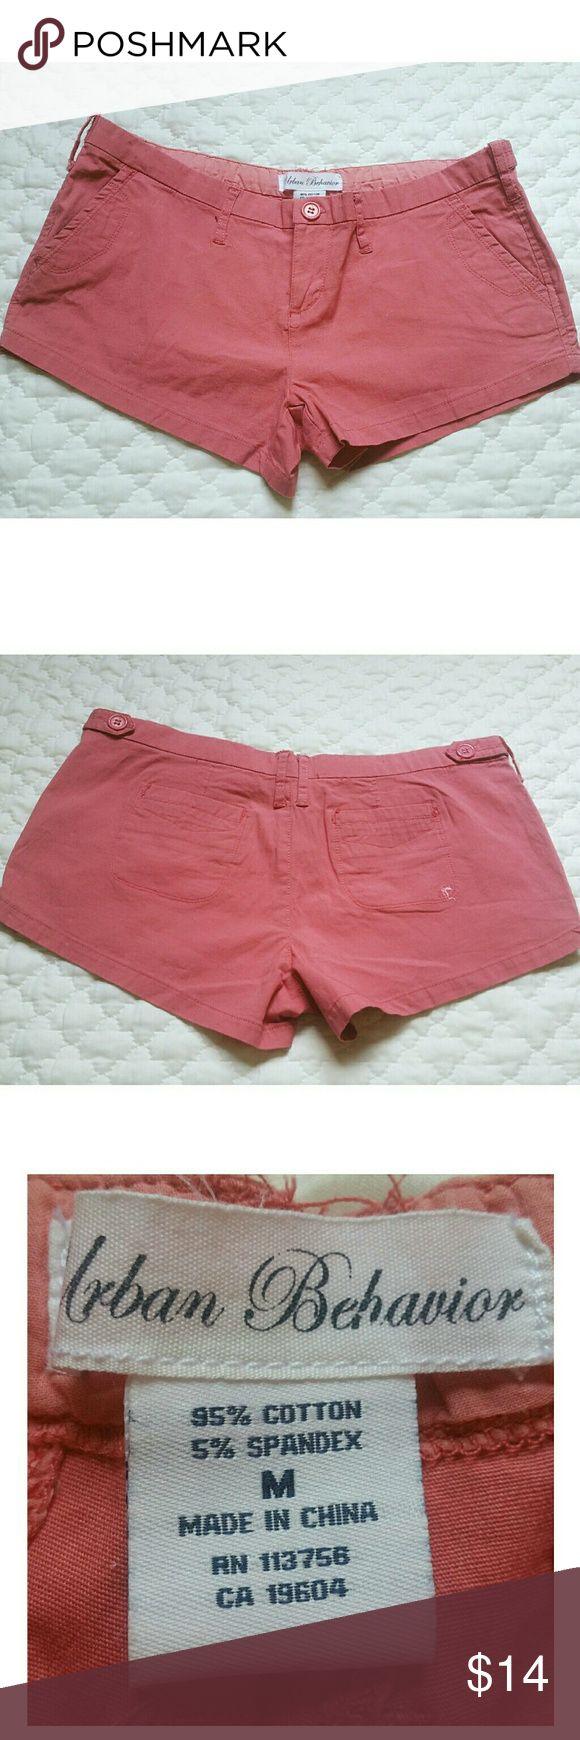 "Urban Behavior shorts M dusty pink 2.5"" inseam NWOT, never worn 7.5"" rise 2.5"" inseam 16"" flat at waistband  Dusty pink cotton Chino style Urban Behavior Shorts"